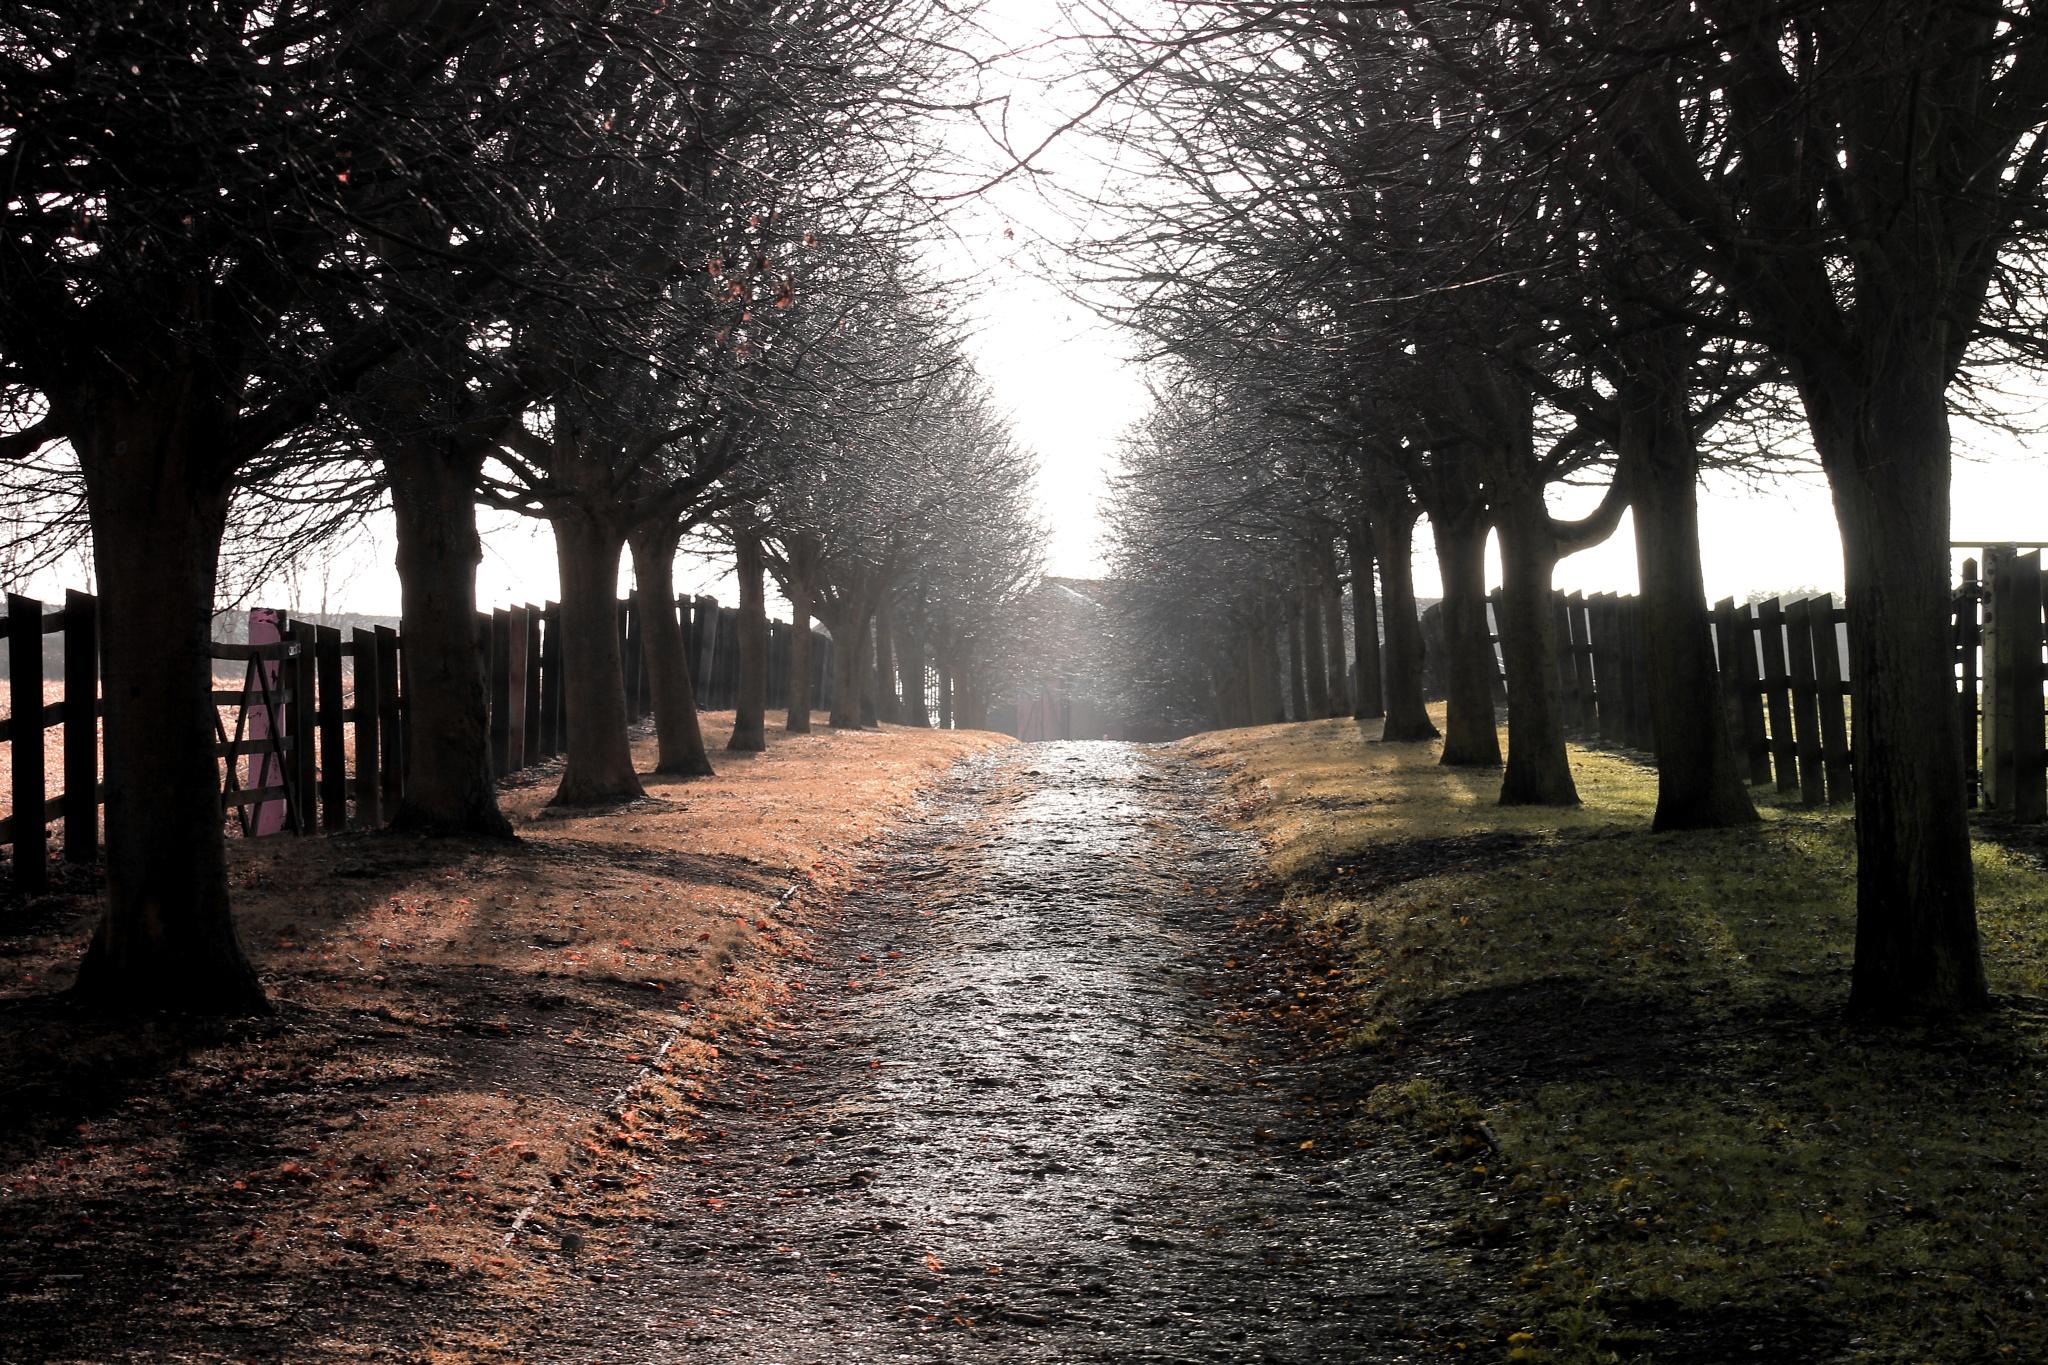 Rural lane by Lsb23